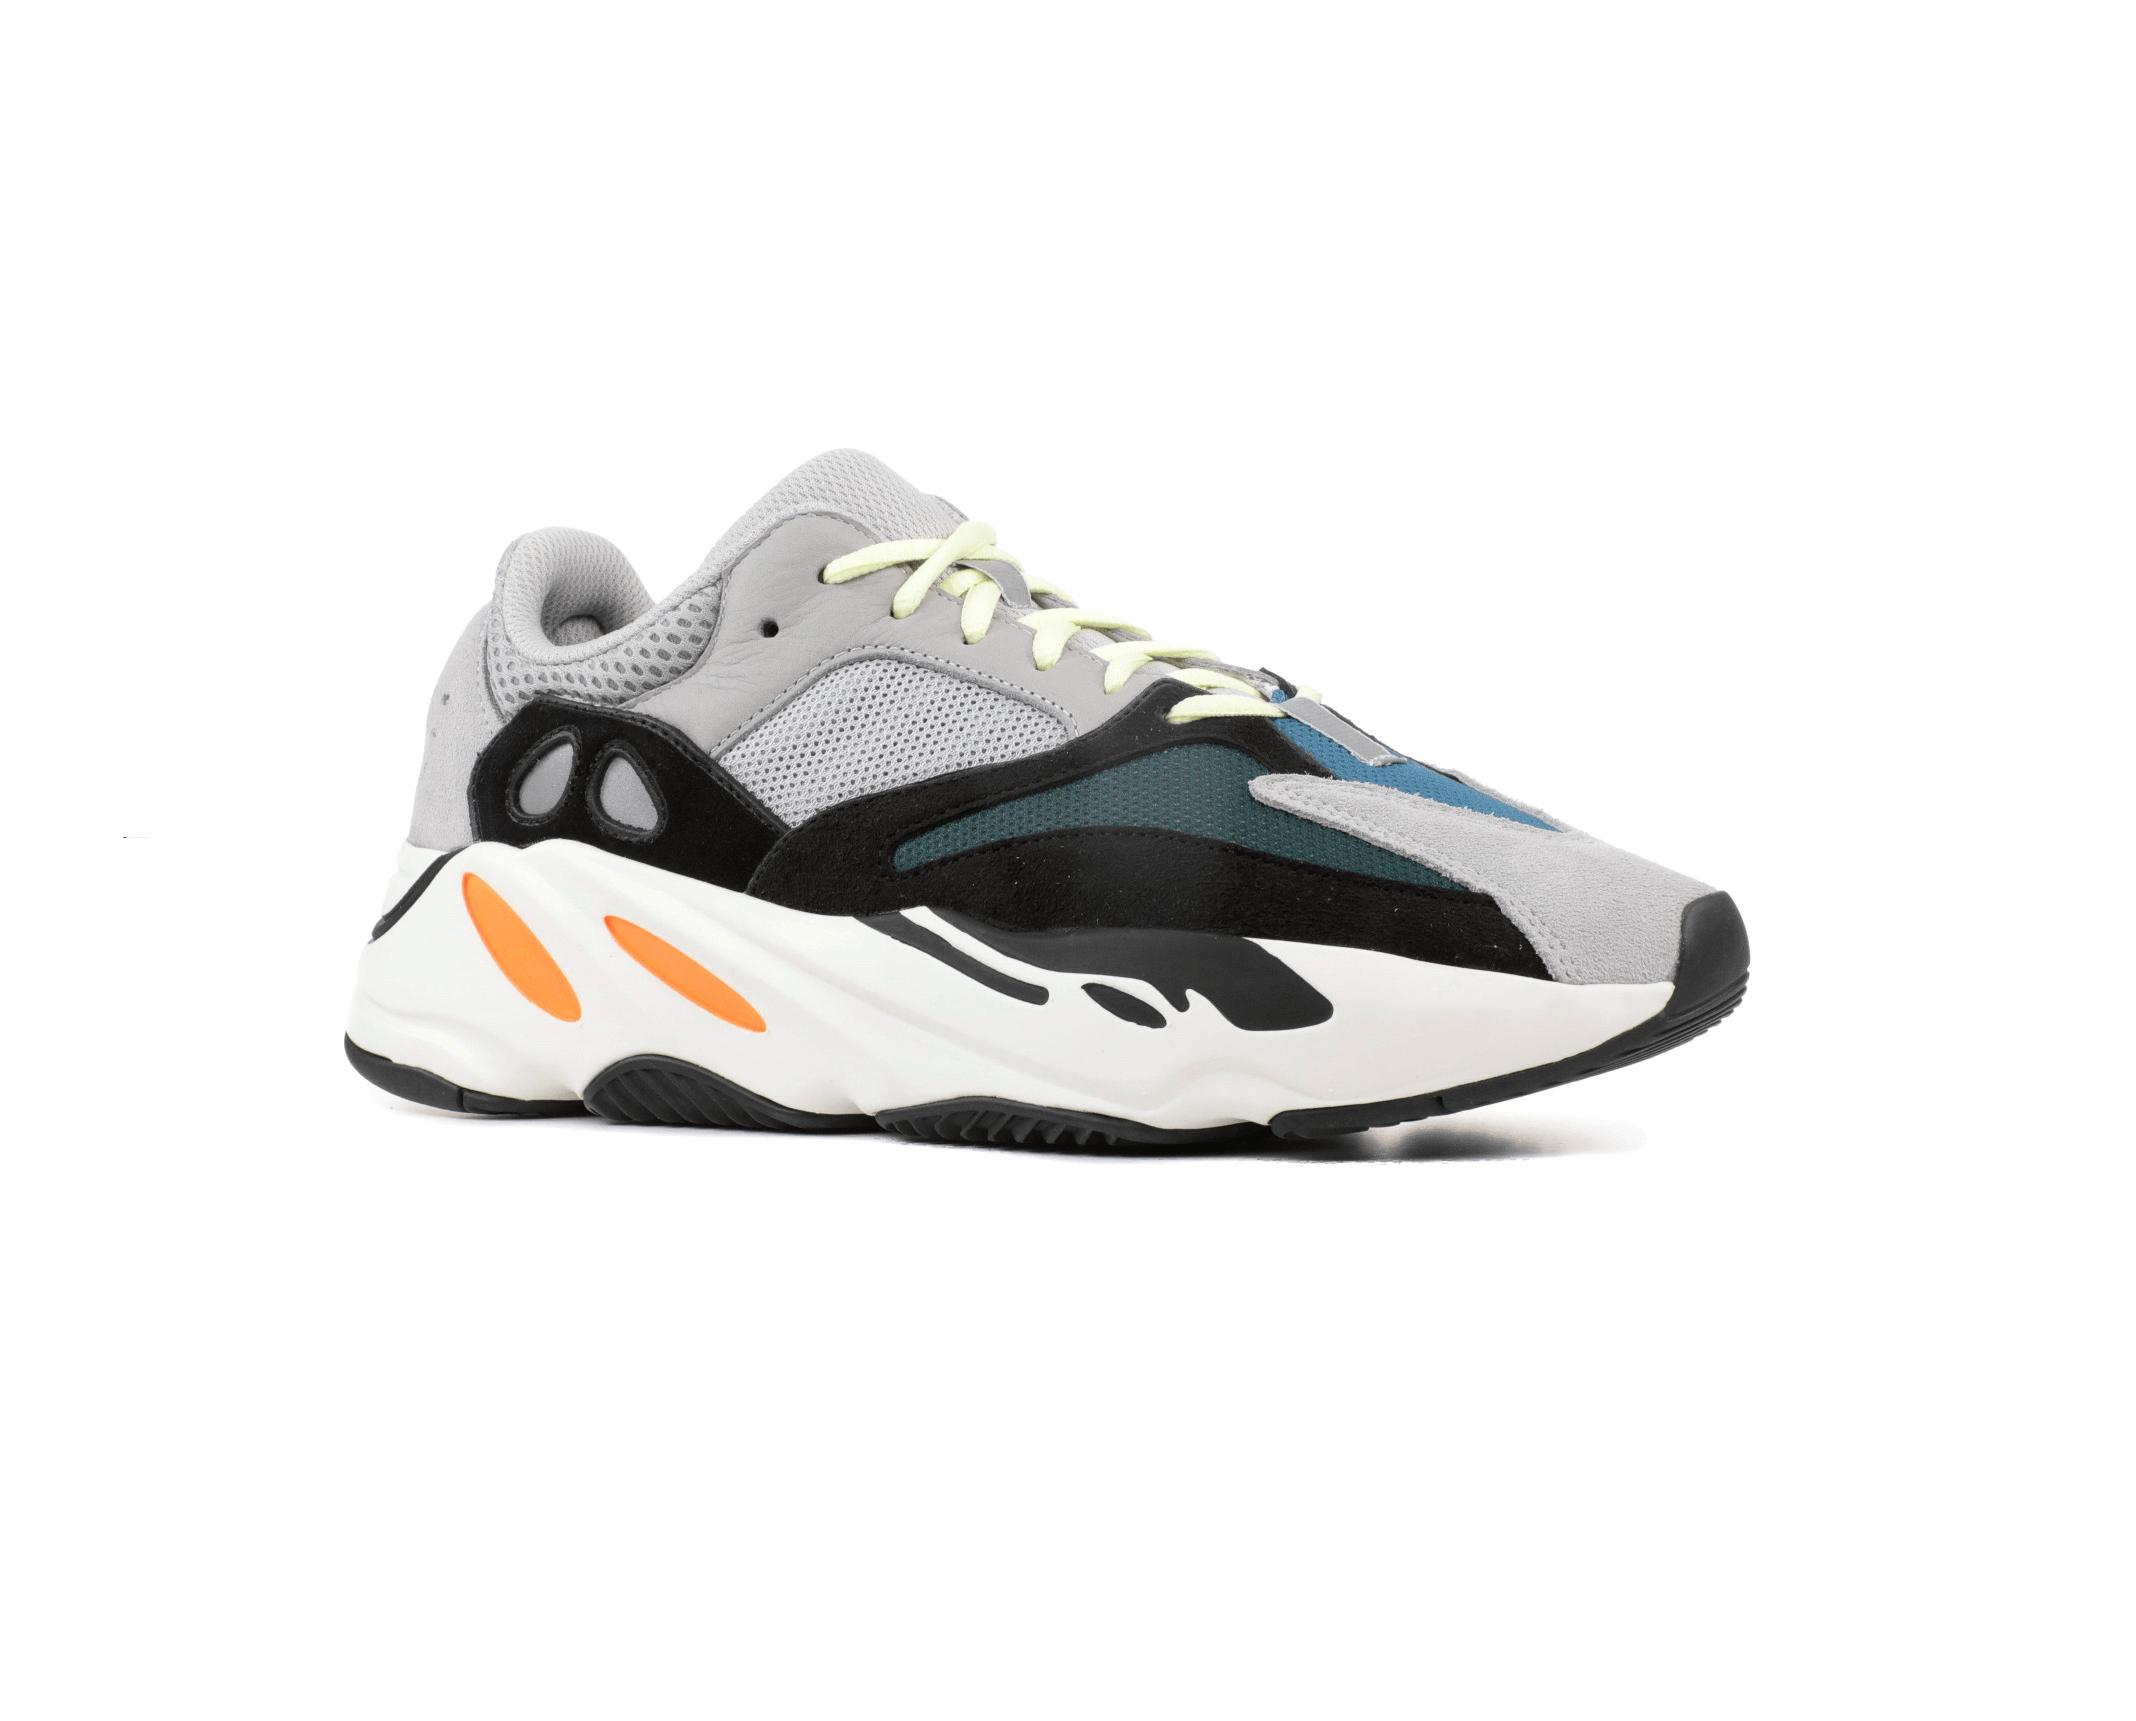 4ca2a2083bc5 Adidas Yeezy 700 Wave Runner – Kerimago